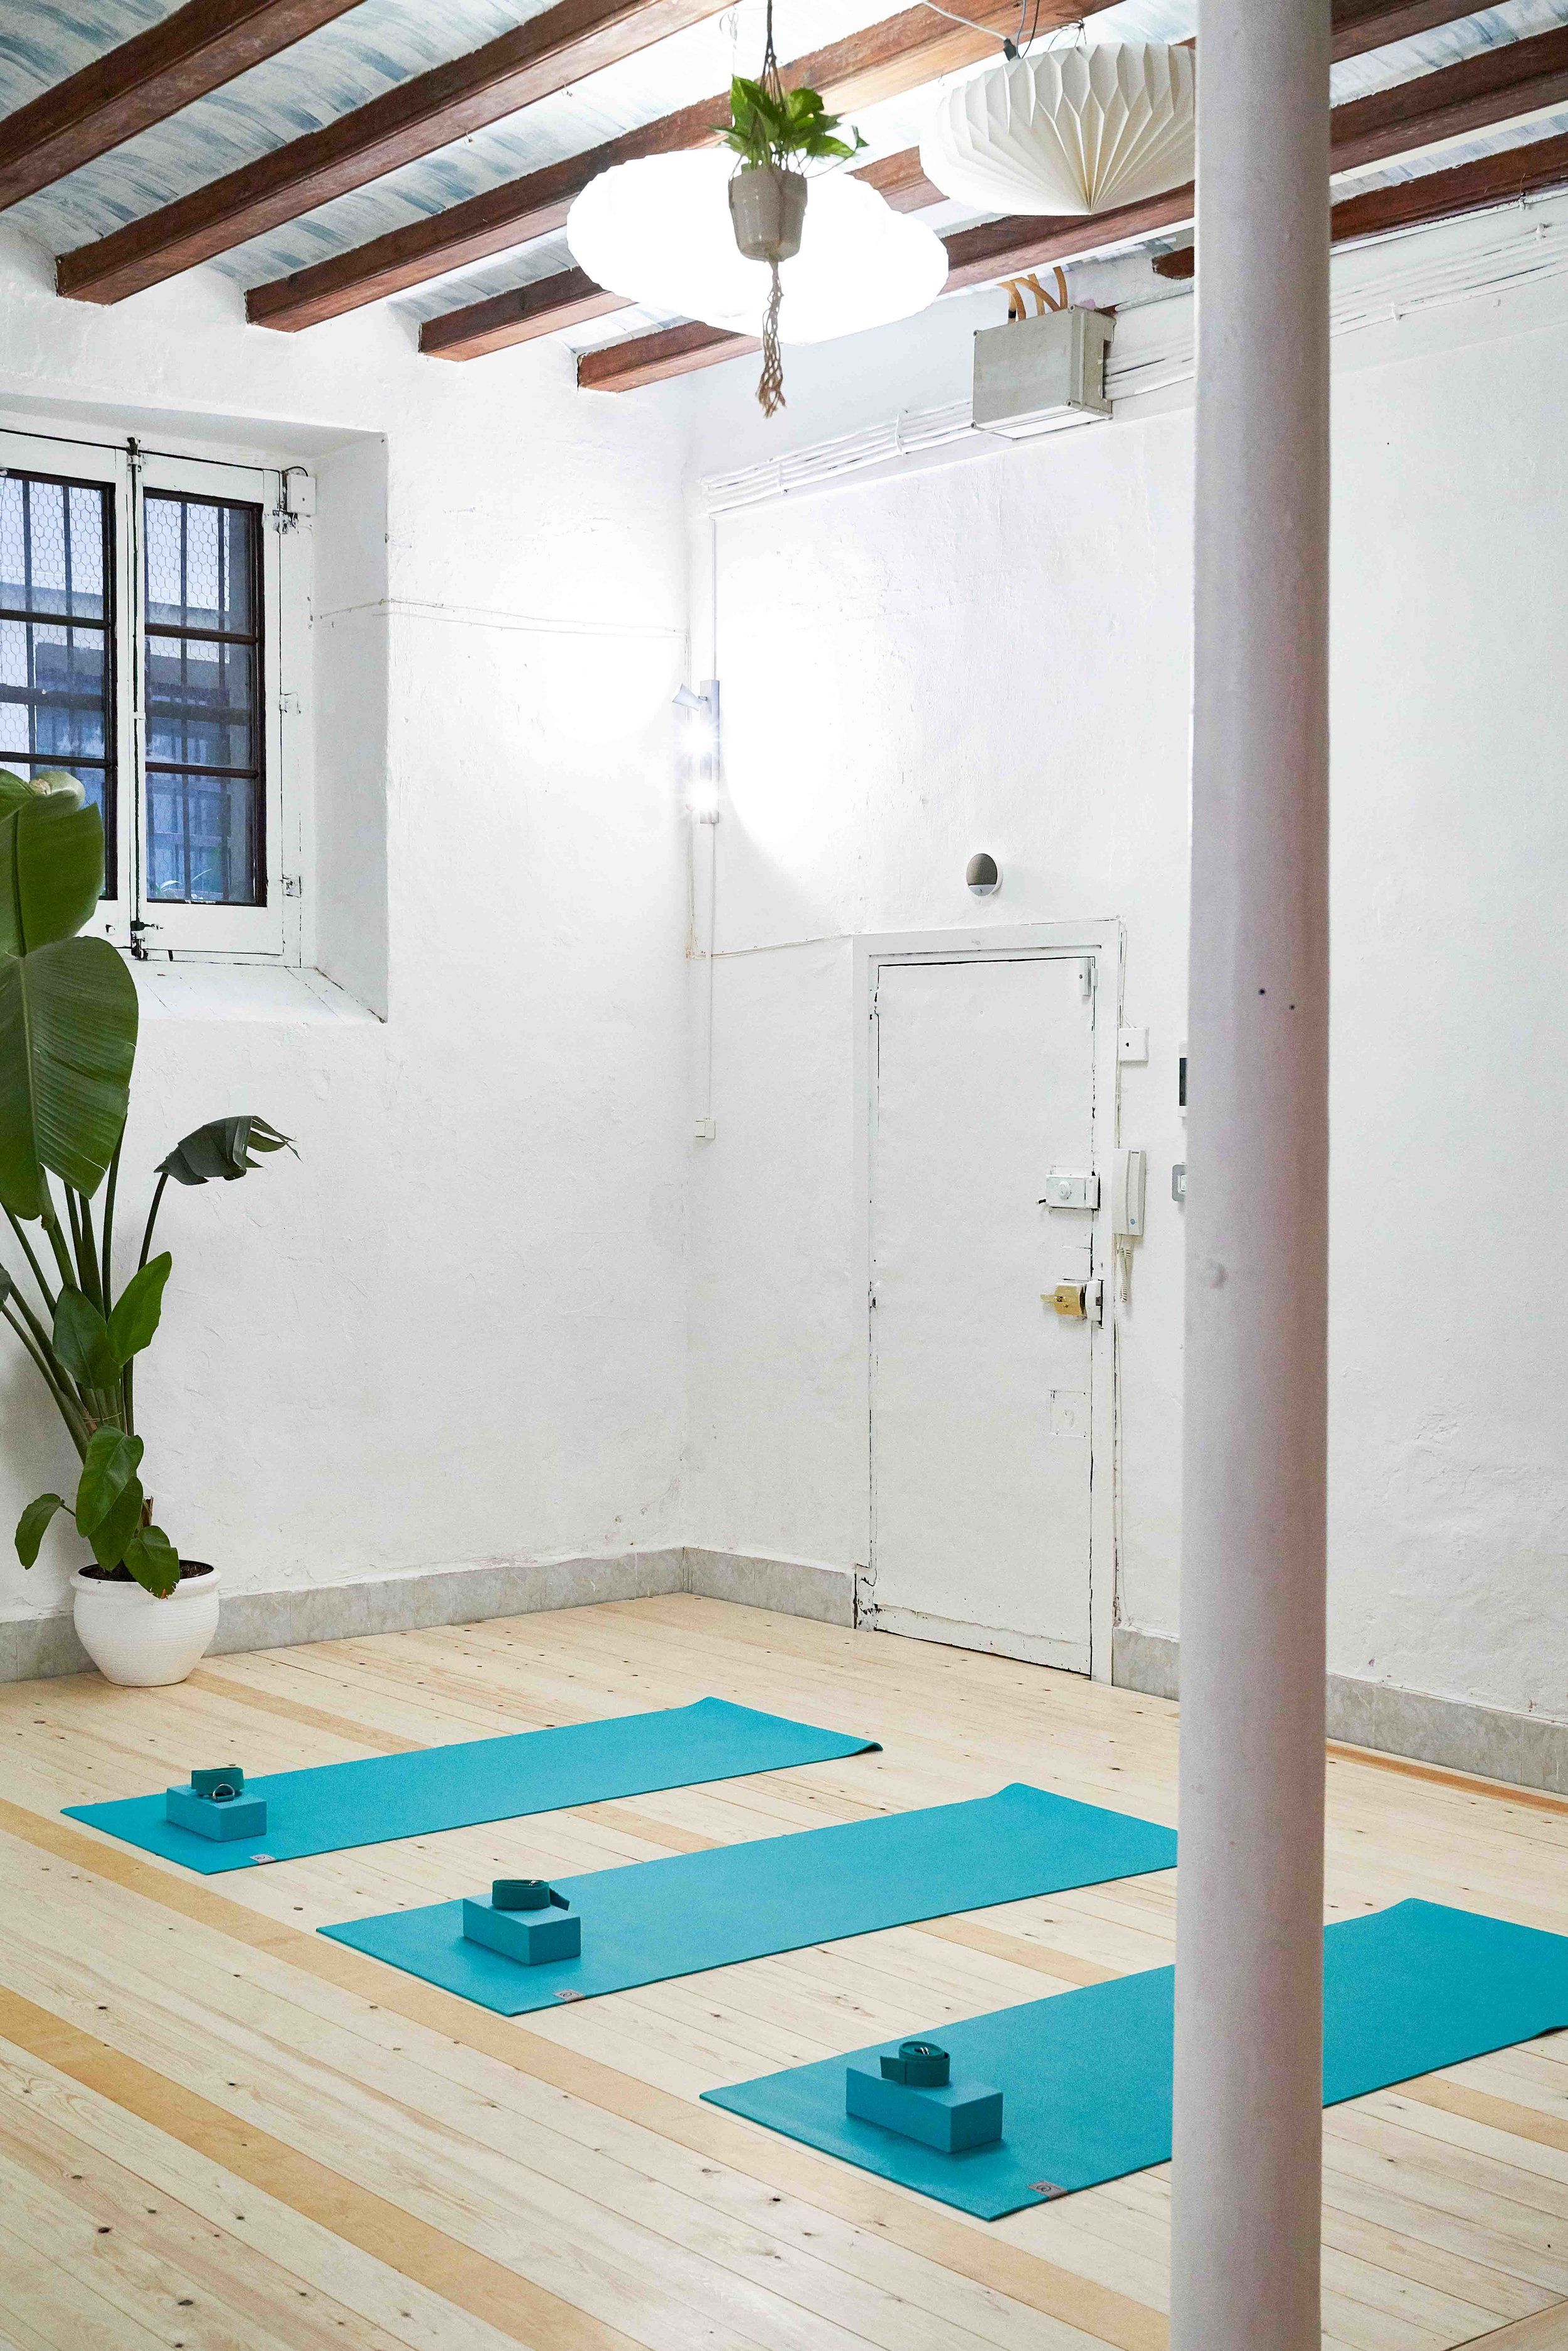 Yoga studio barcelona small (1 of 1)-2.jpg